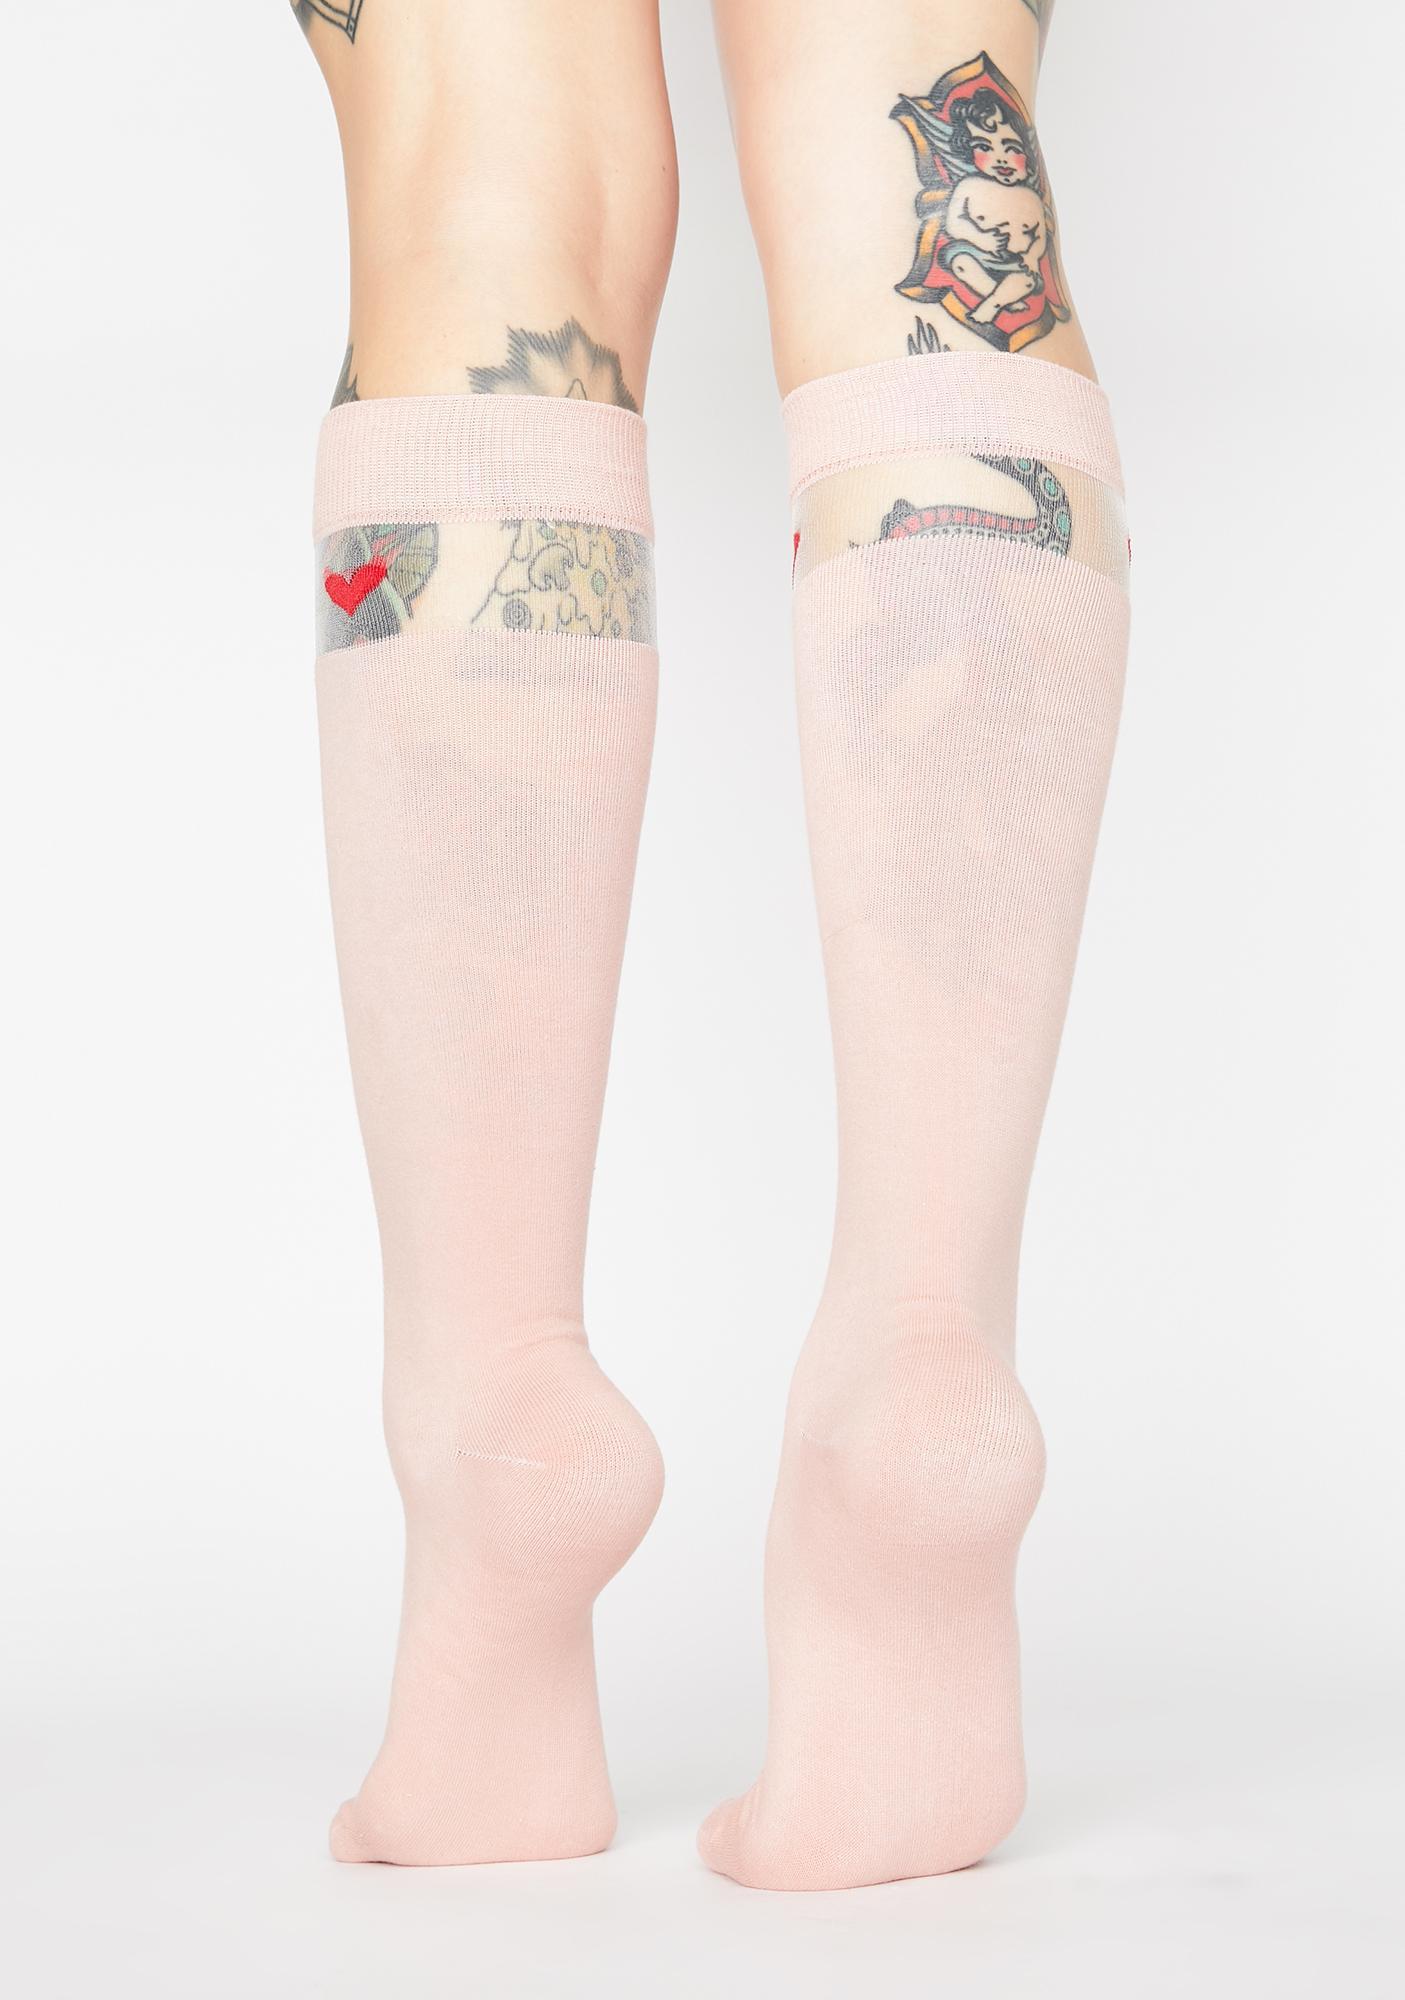 Half Of My Heart Knee High Socks